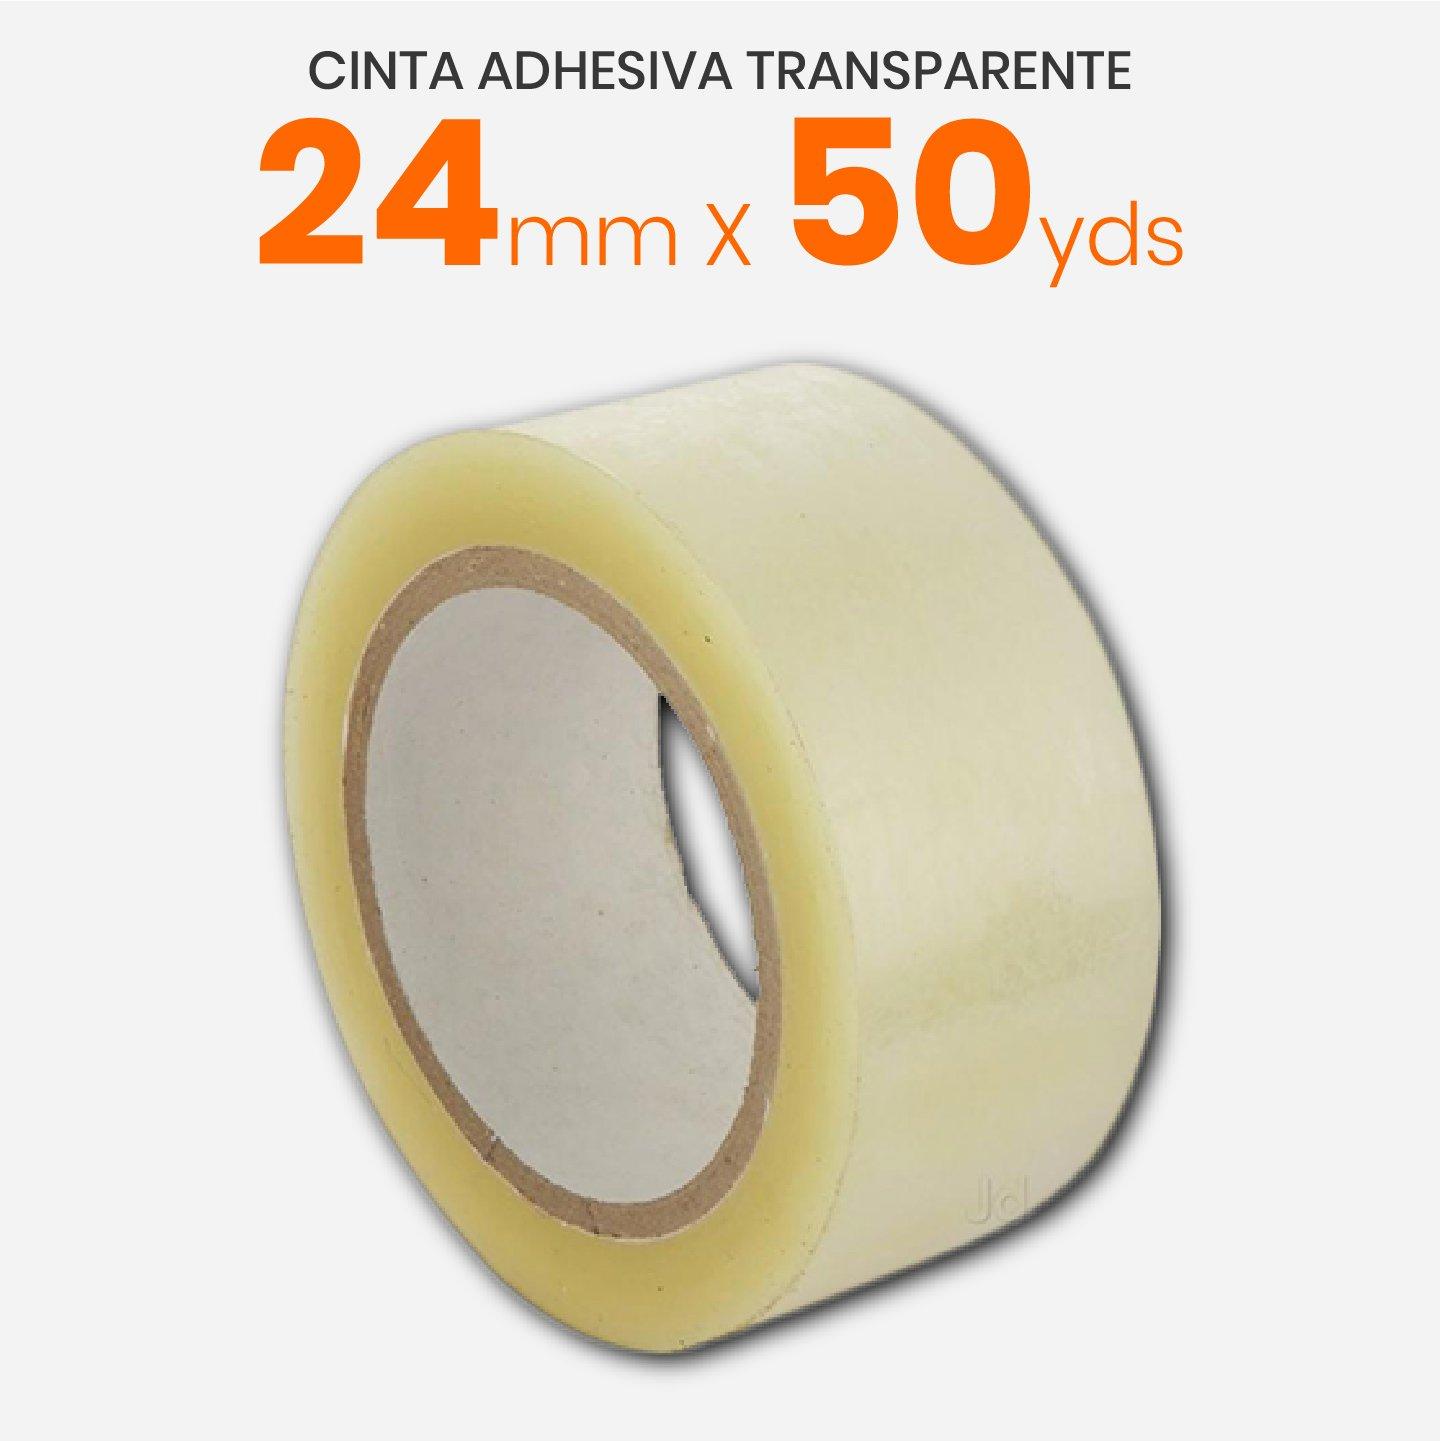 Cinta Adhesiva Transparente 24mm x 50yds